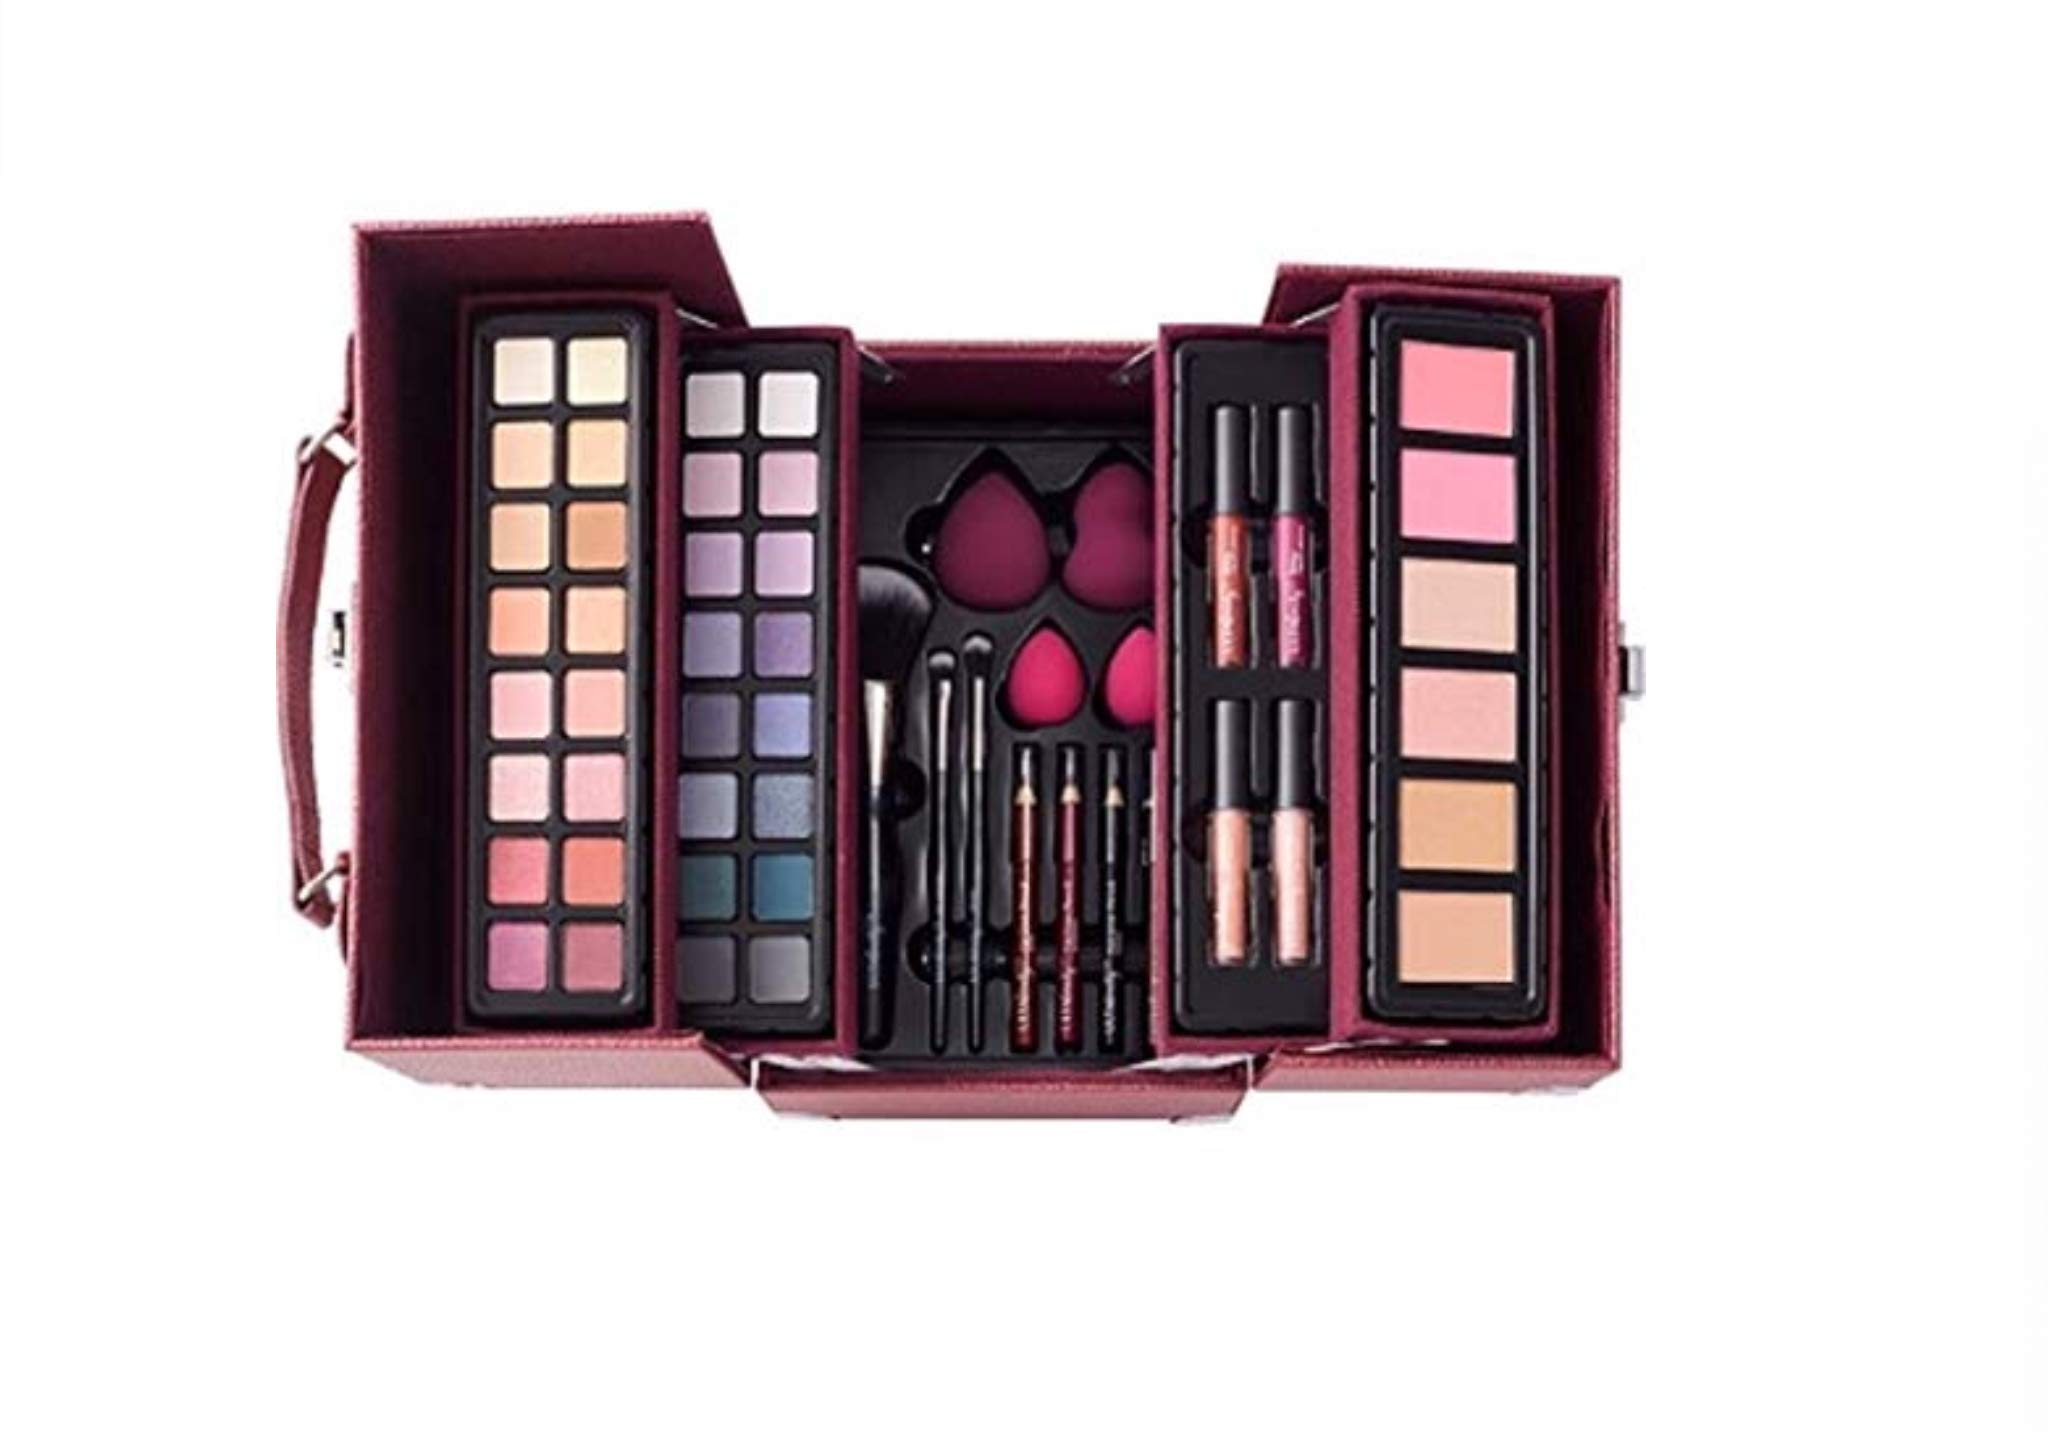 60f8eaf8adb Amazon.com : Ulta Beauty Glam and Glow 53 Piece Makeup Train Case Set Berry  Plum Color : Beauty